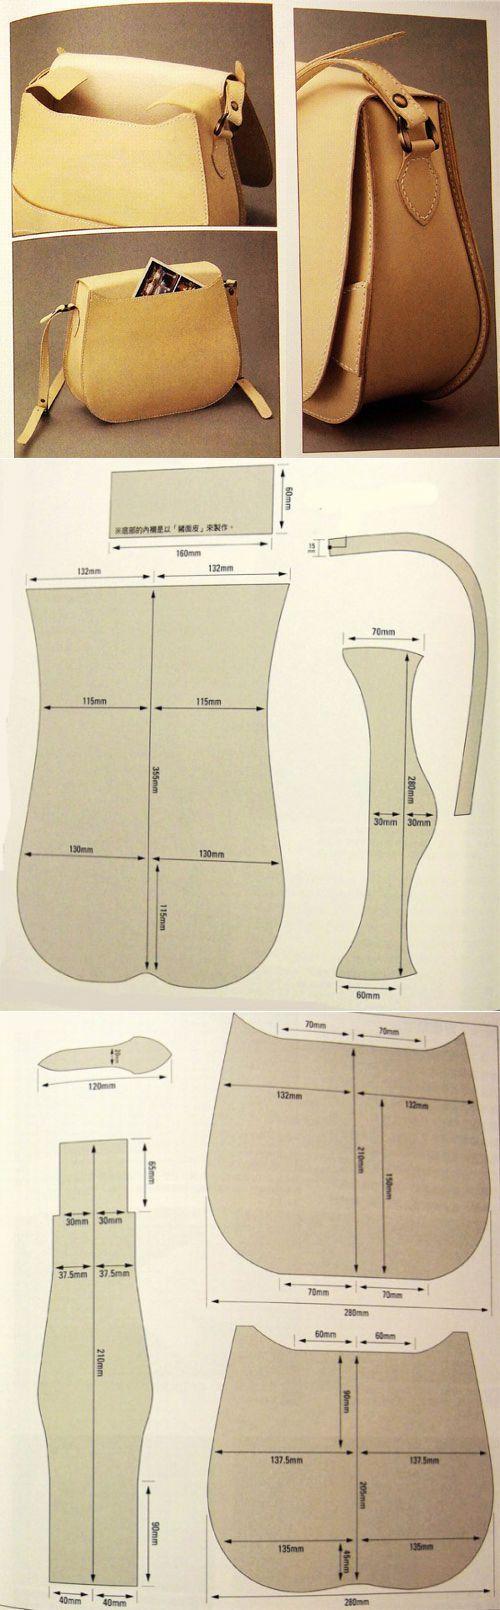 12 mejores imágenes sobre Leather anatomy en Pinterest | Longchamp ...